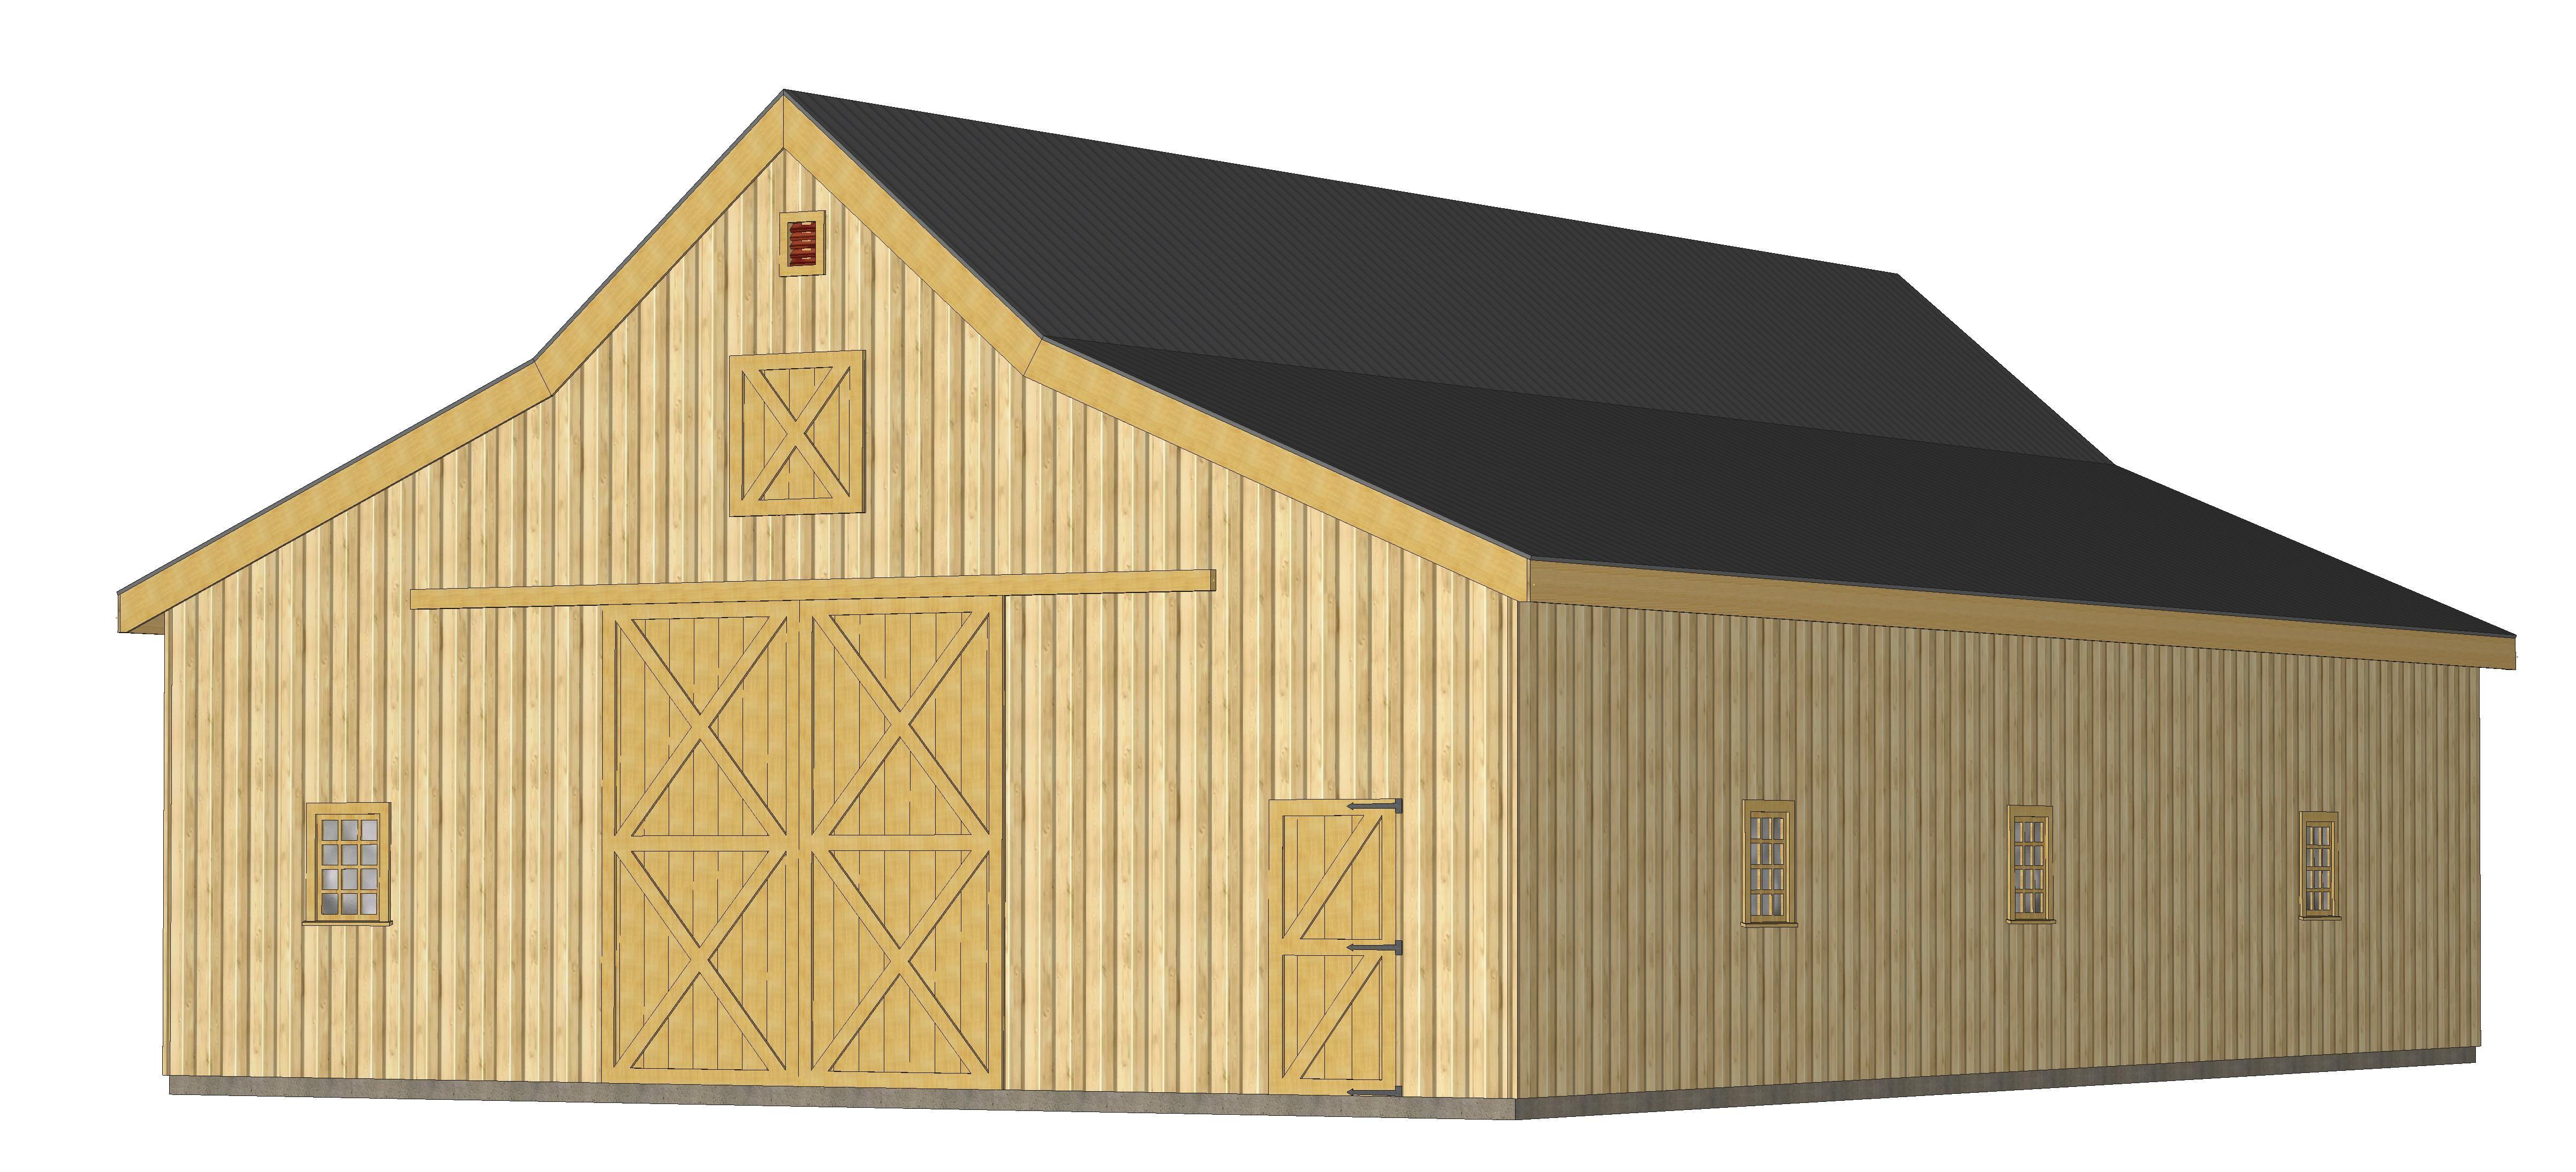 Pre Packaged Wood Pole Barn Kits Barn Kits Pole Barn House Plans Pole Barn Kits